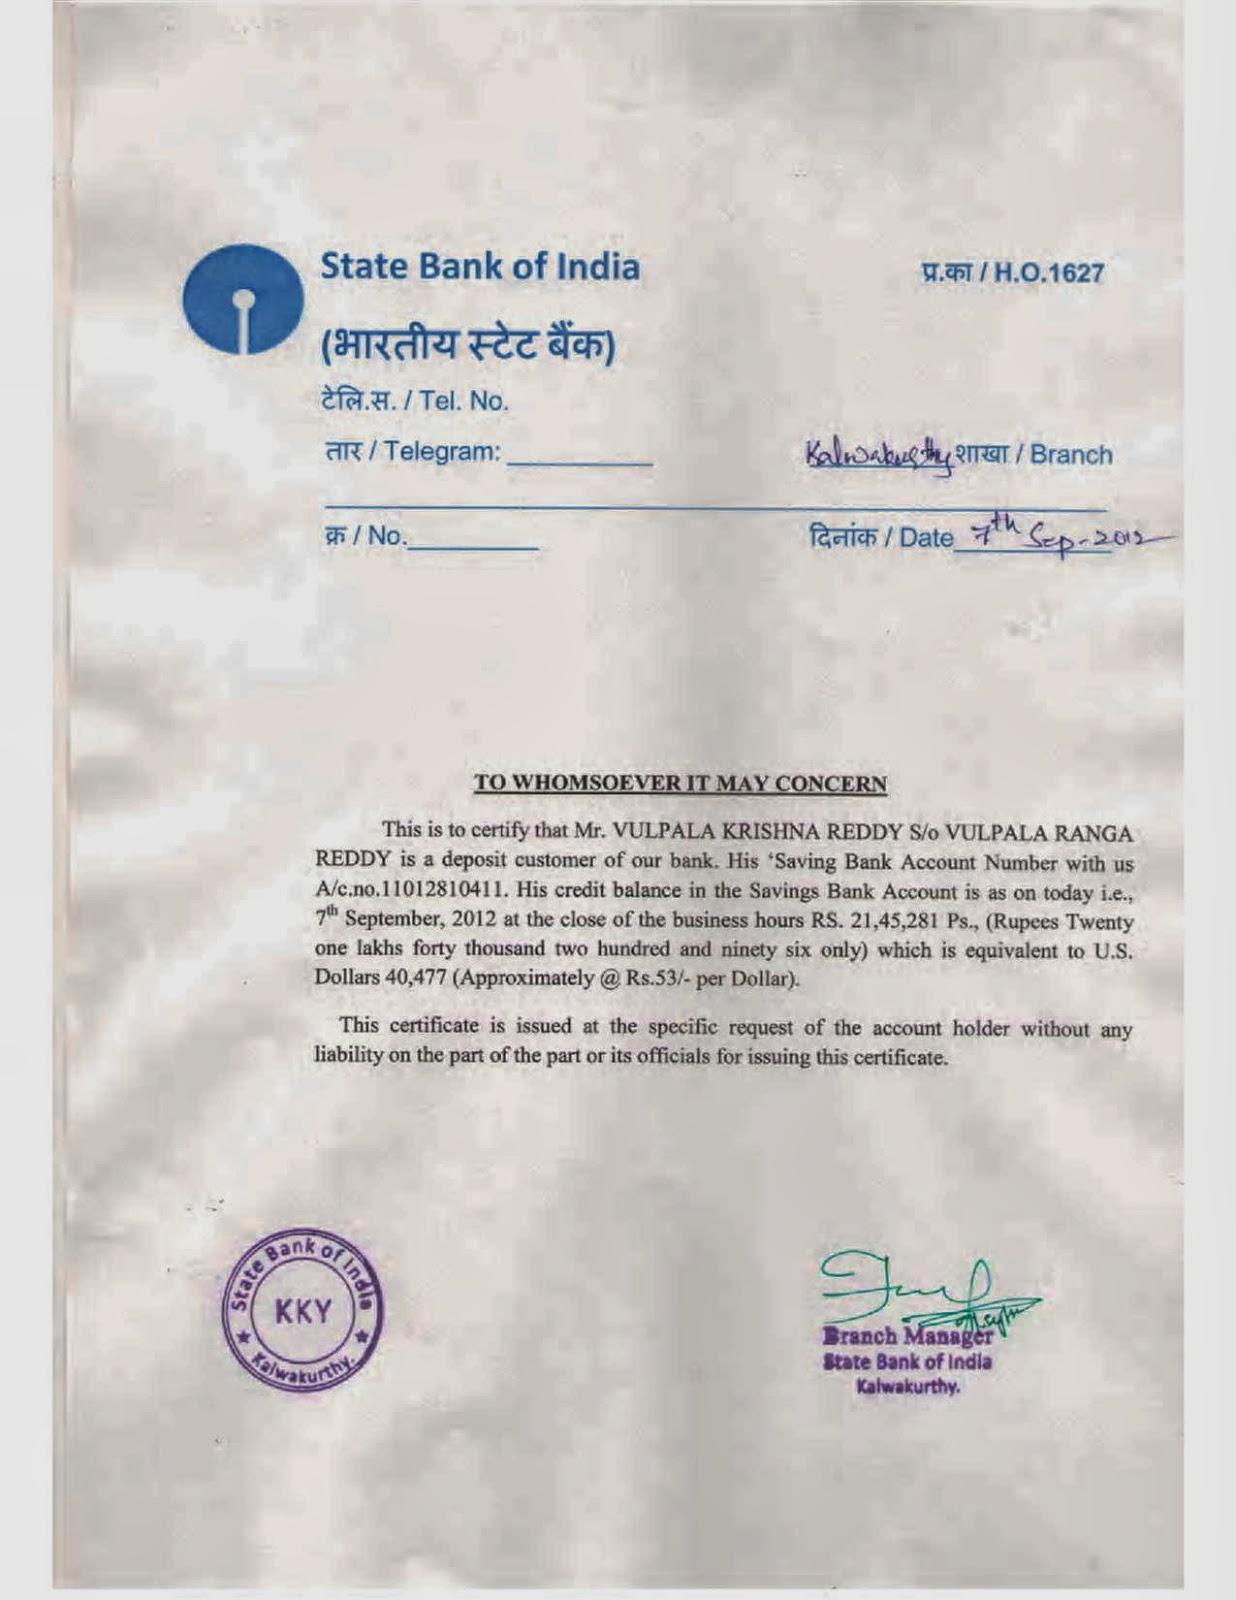 Request letter format bank manager cv resumes maker guide request letter format bank manager sample letter format to request the bank manager to issue letter spiritdancerdesigns Choice Image